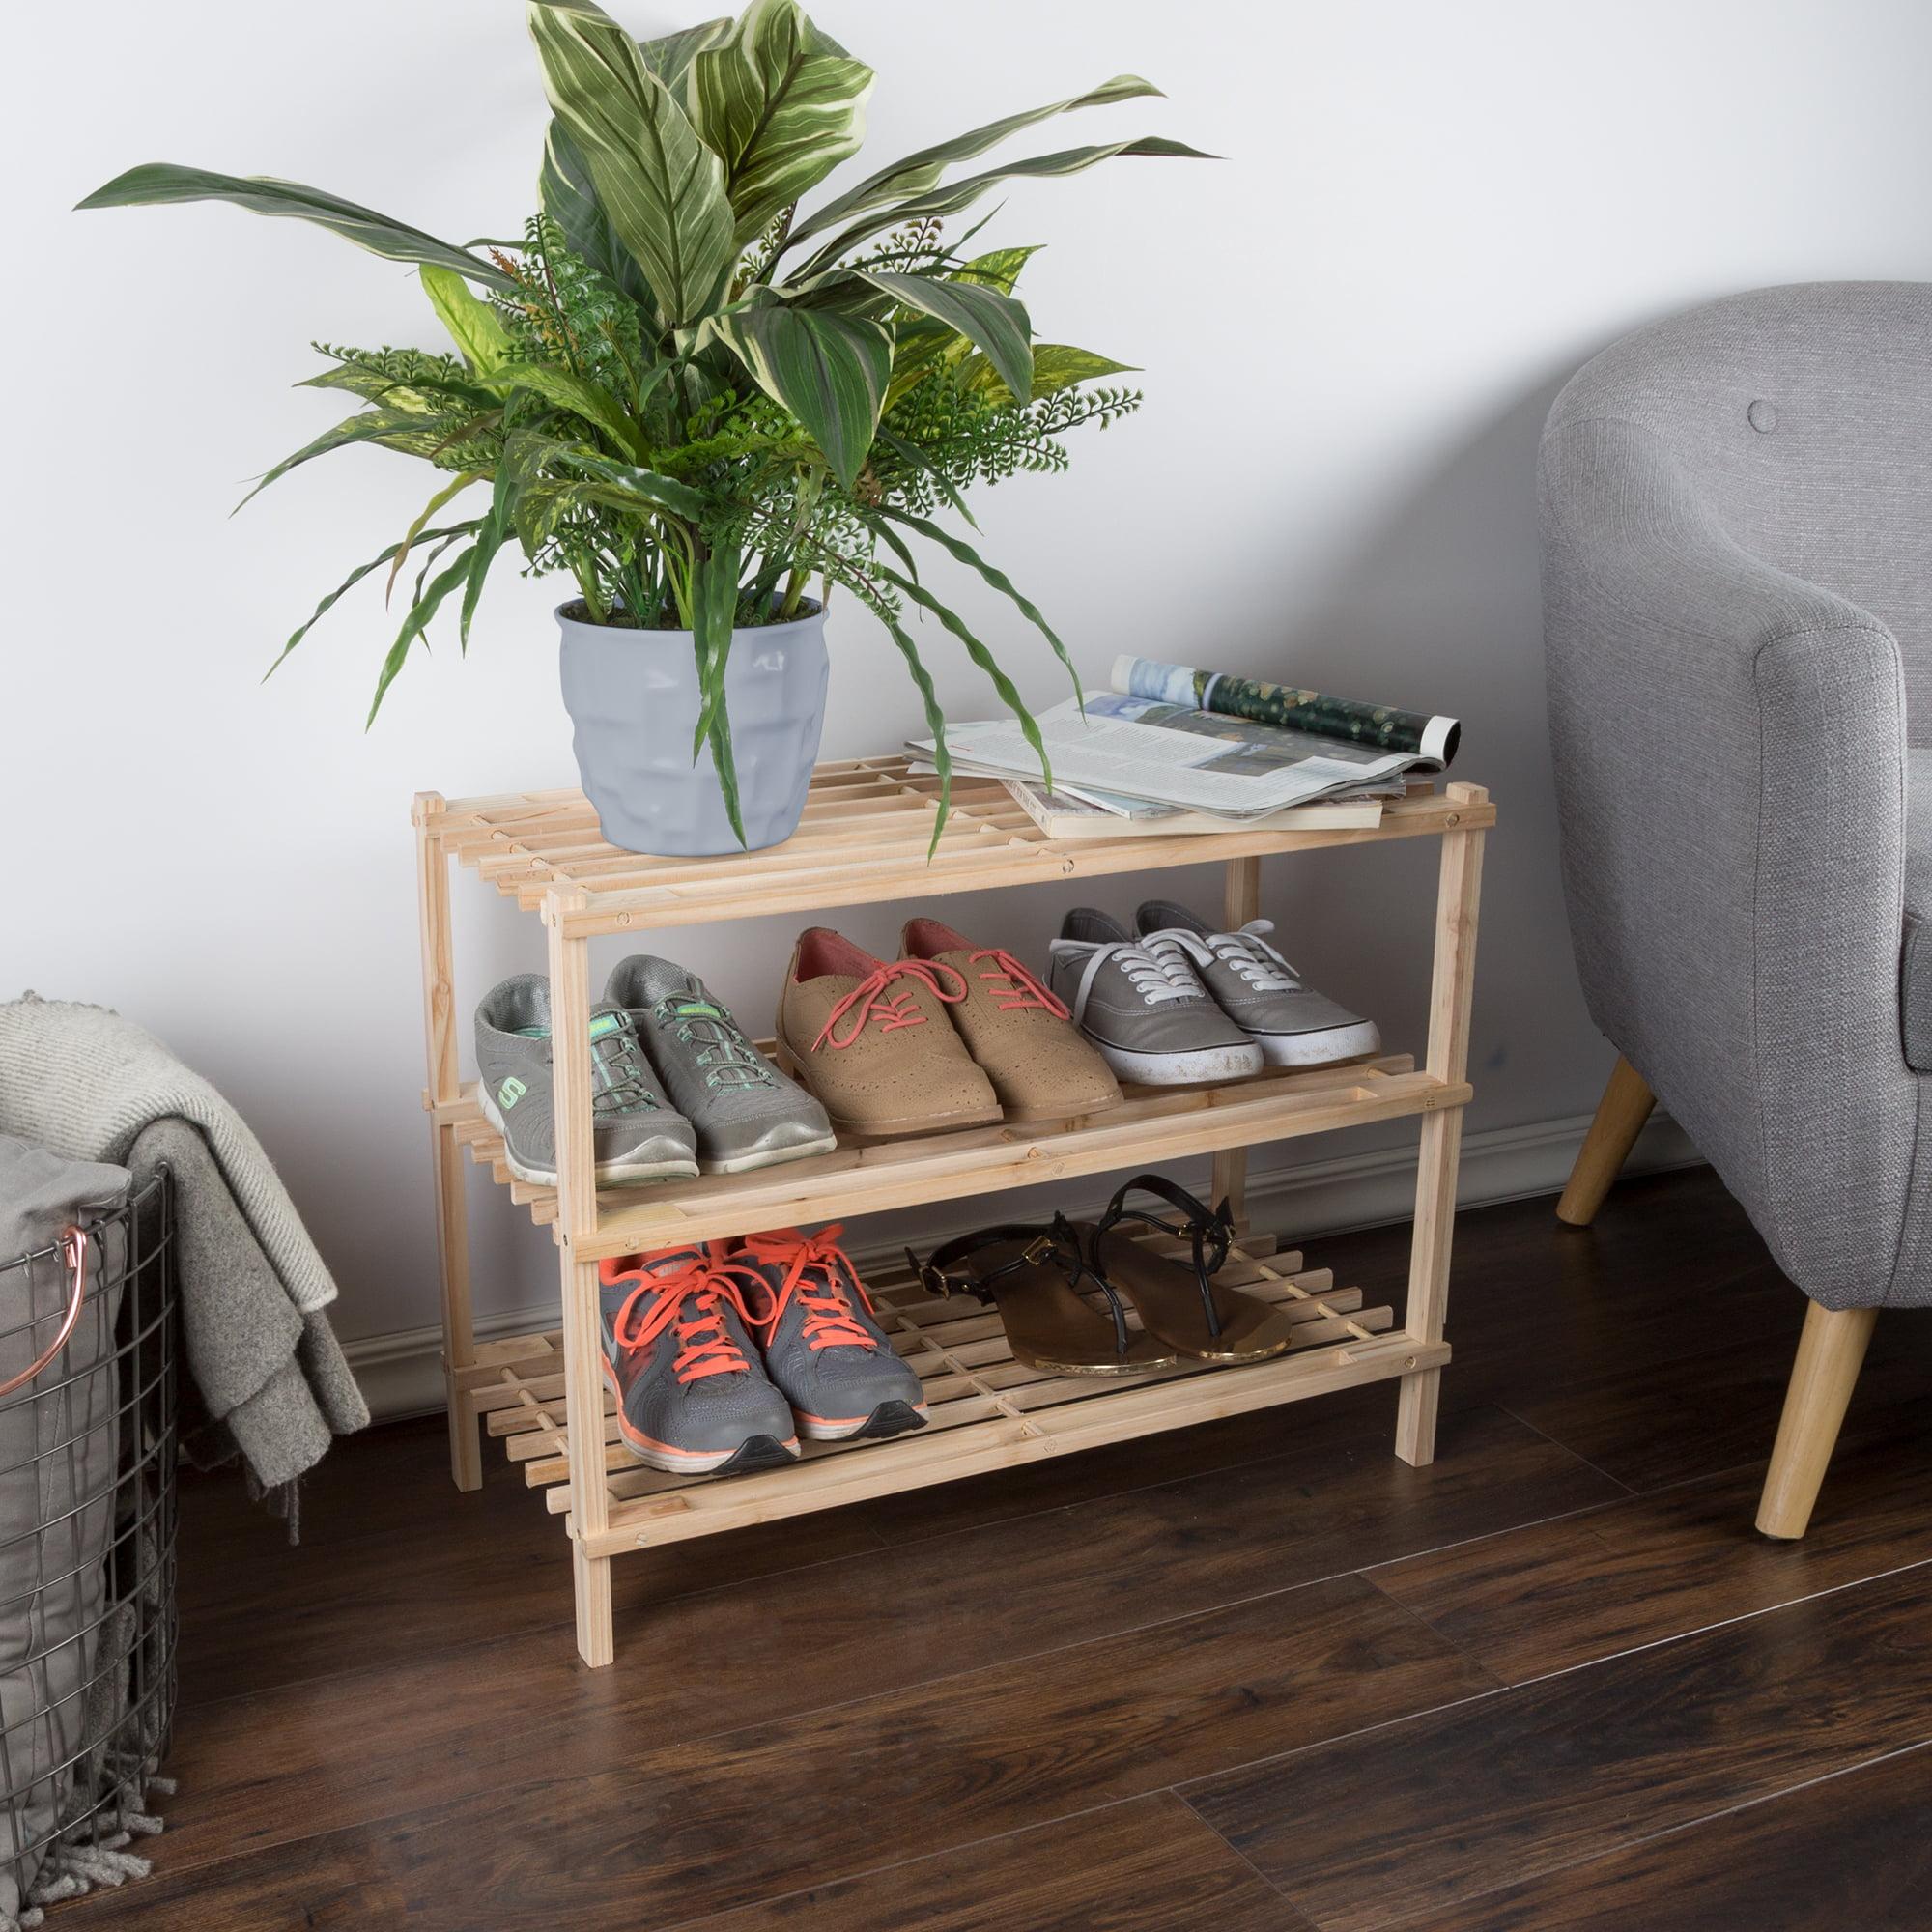 Wood Shoe Rack, Storage Bench – Closet, Bathroom, Kitchen, Entry Organizer, 2, 3, or 4-Tier Space Saver Shoe Rack by Lavish Home